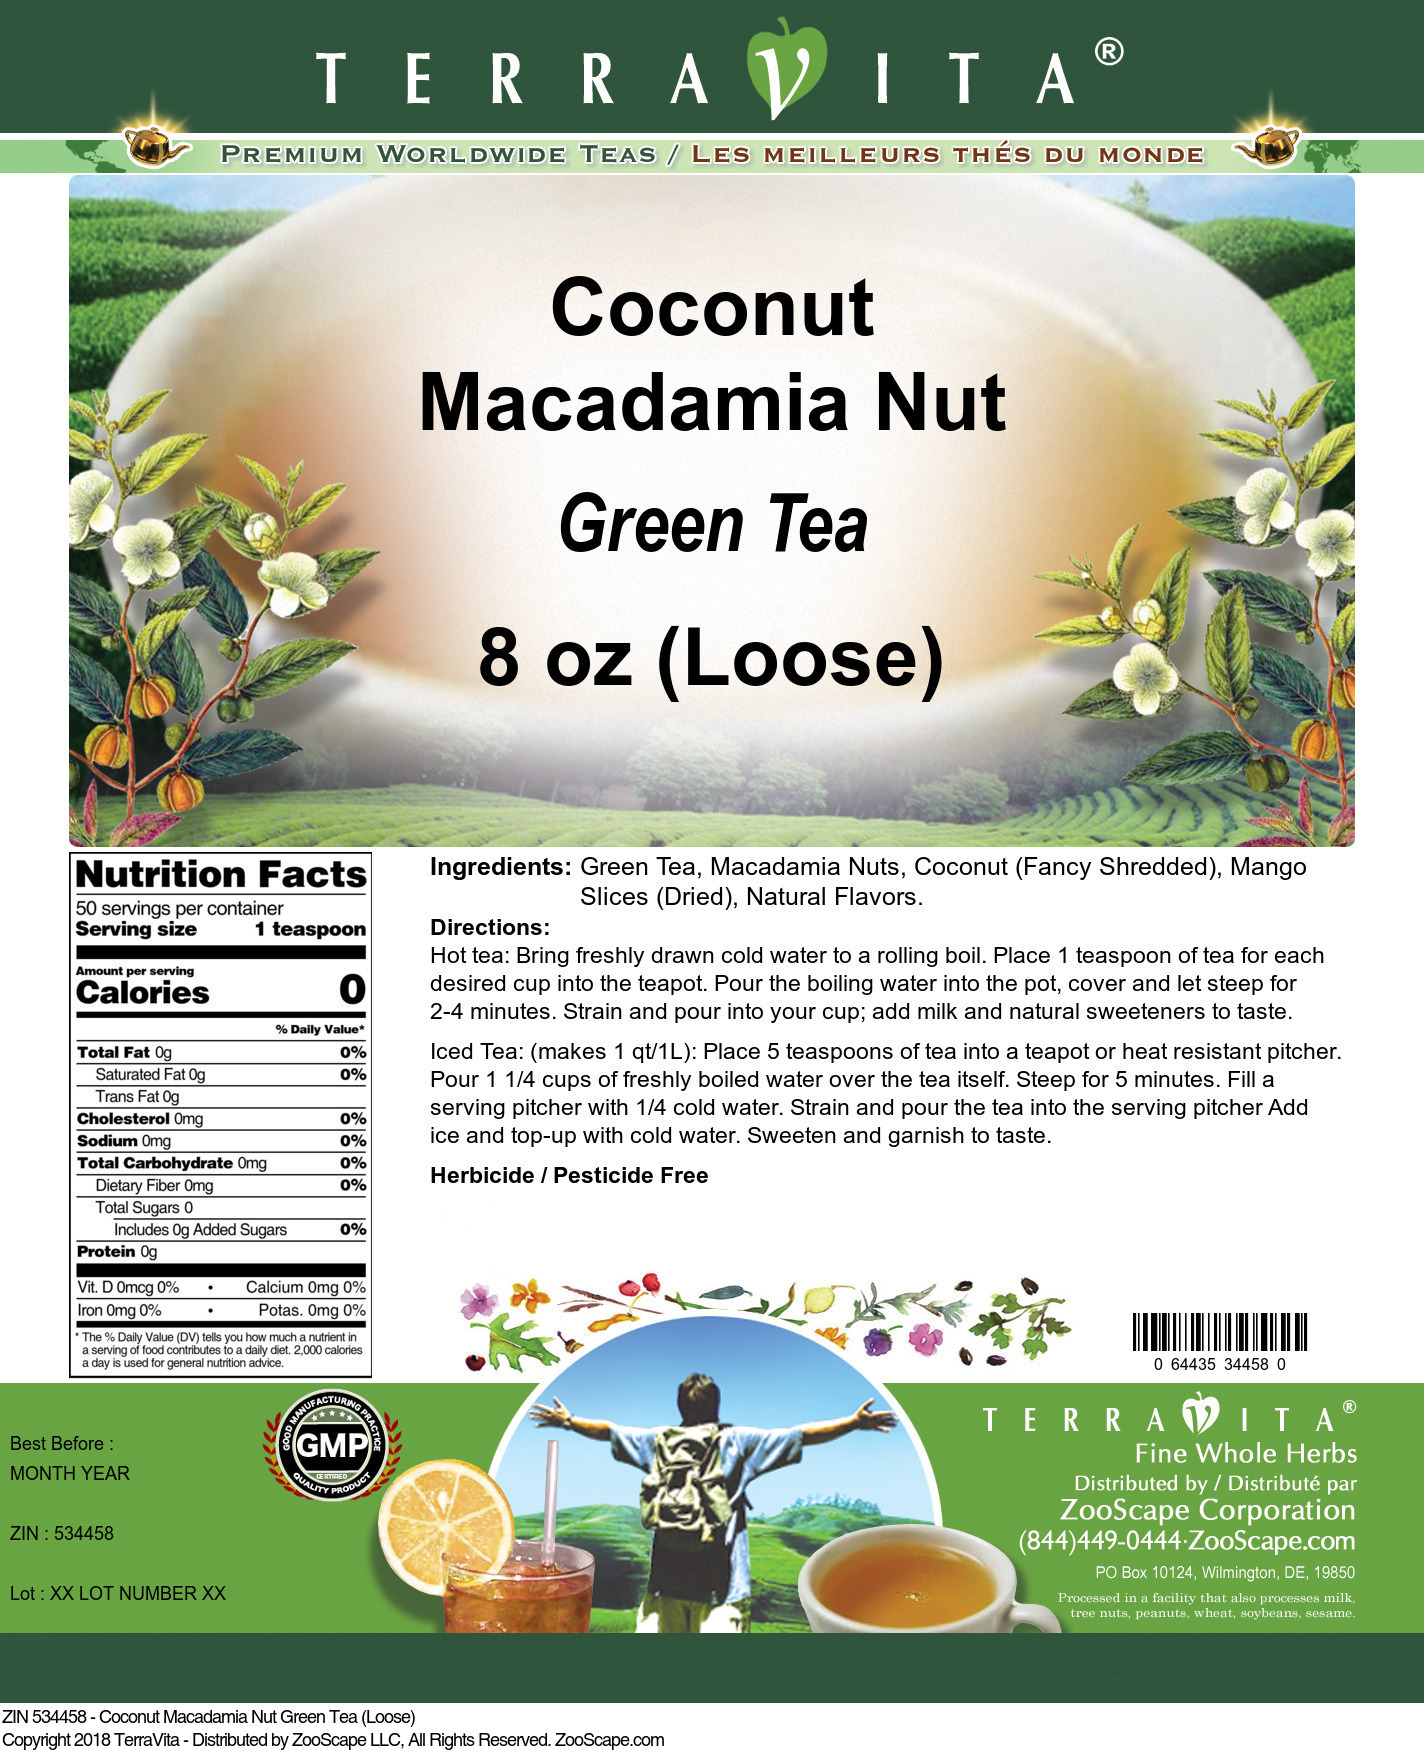 Coconut Macadamia Nut Green Tea (Loose)